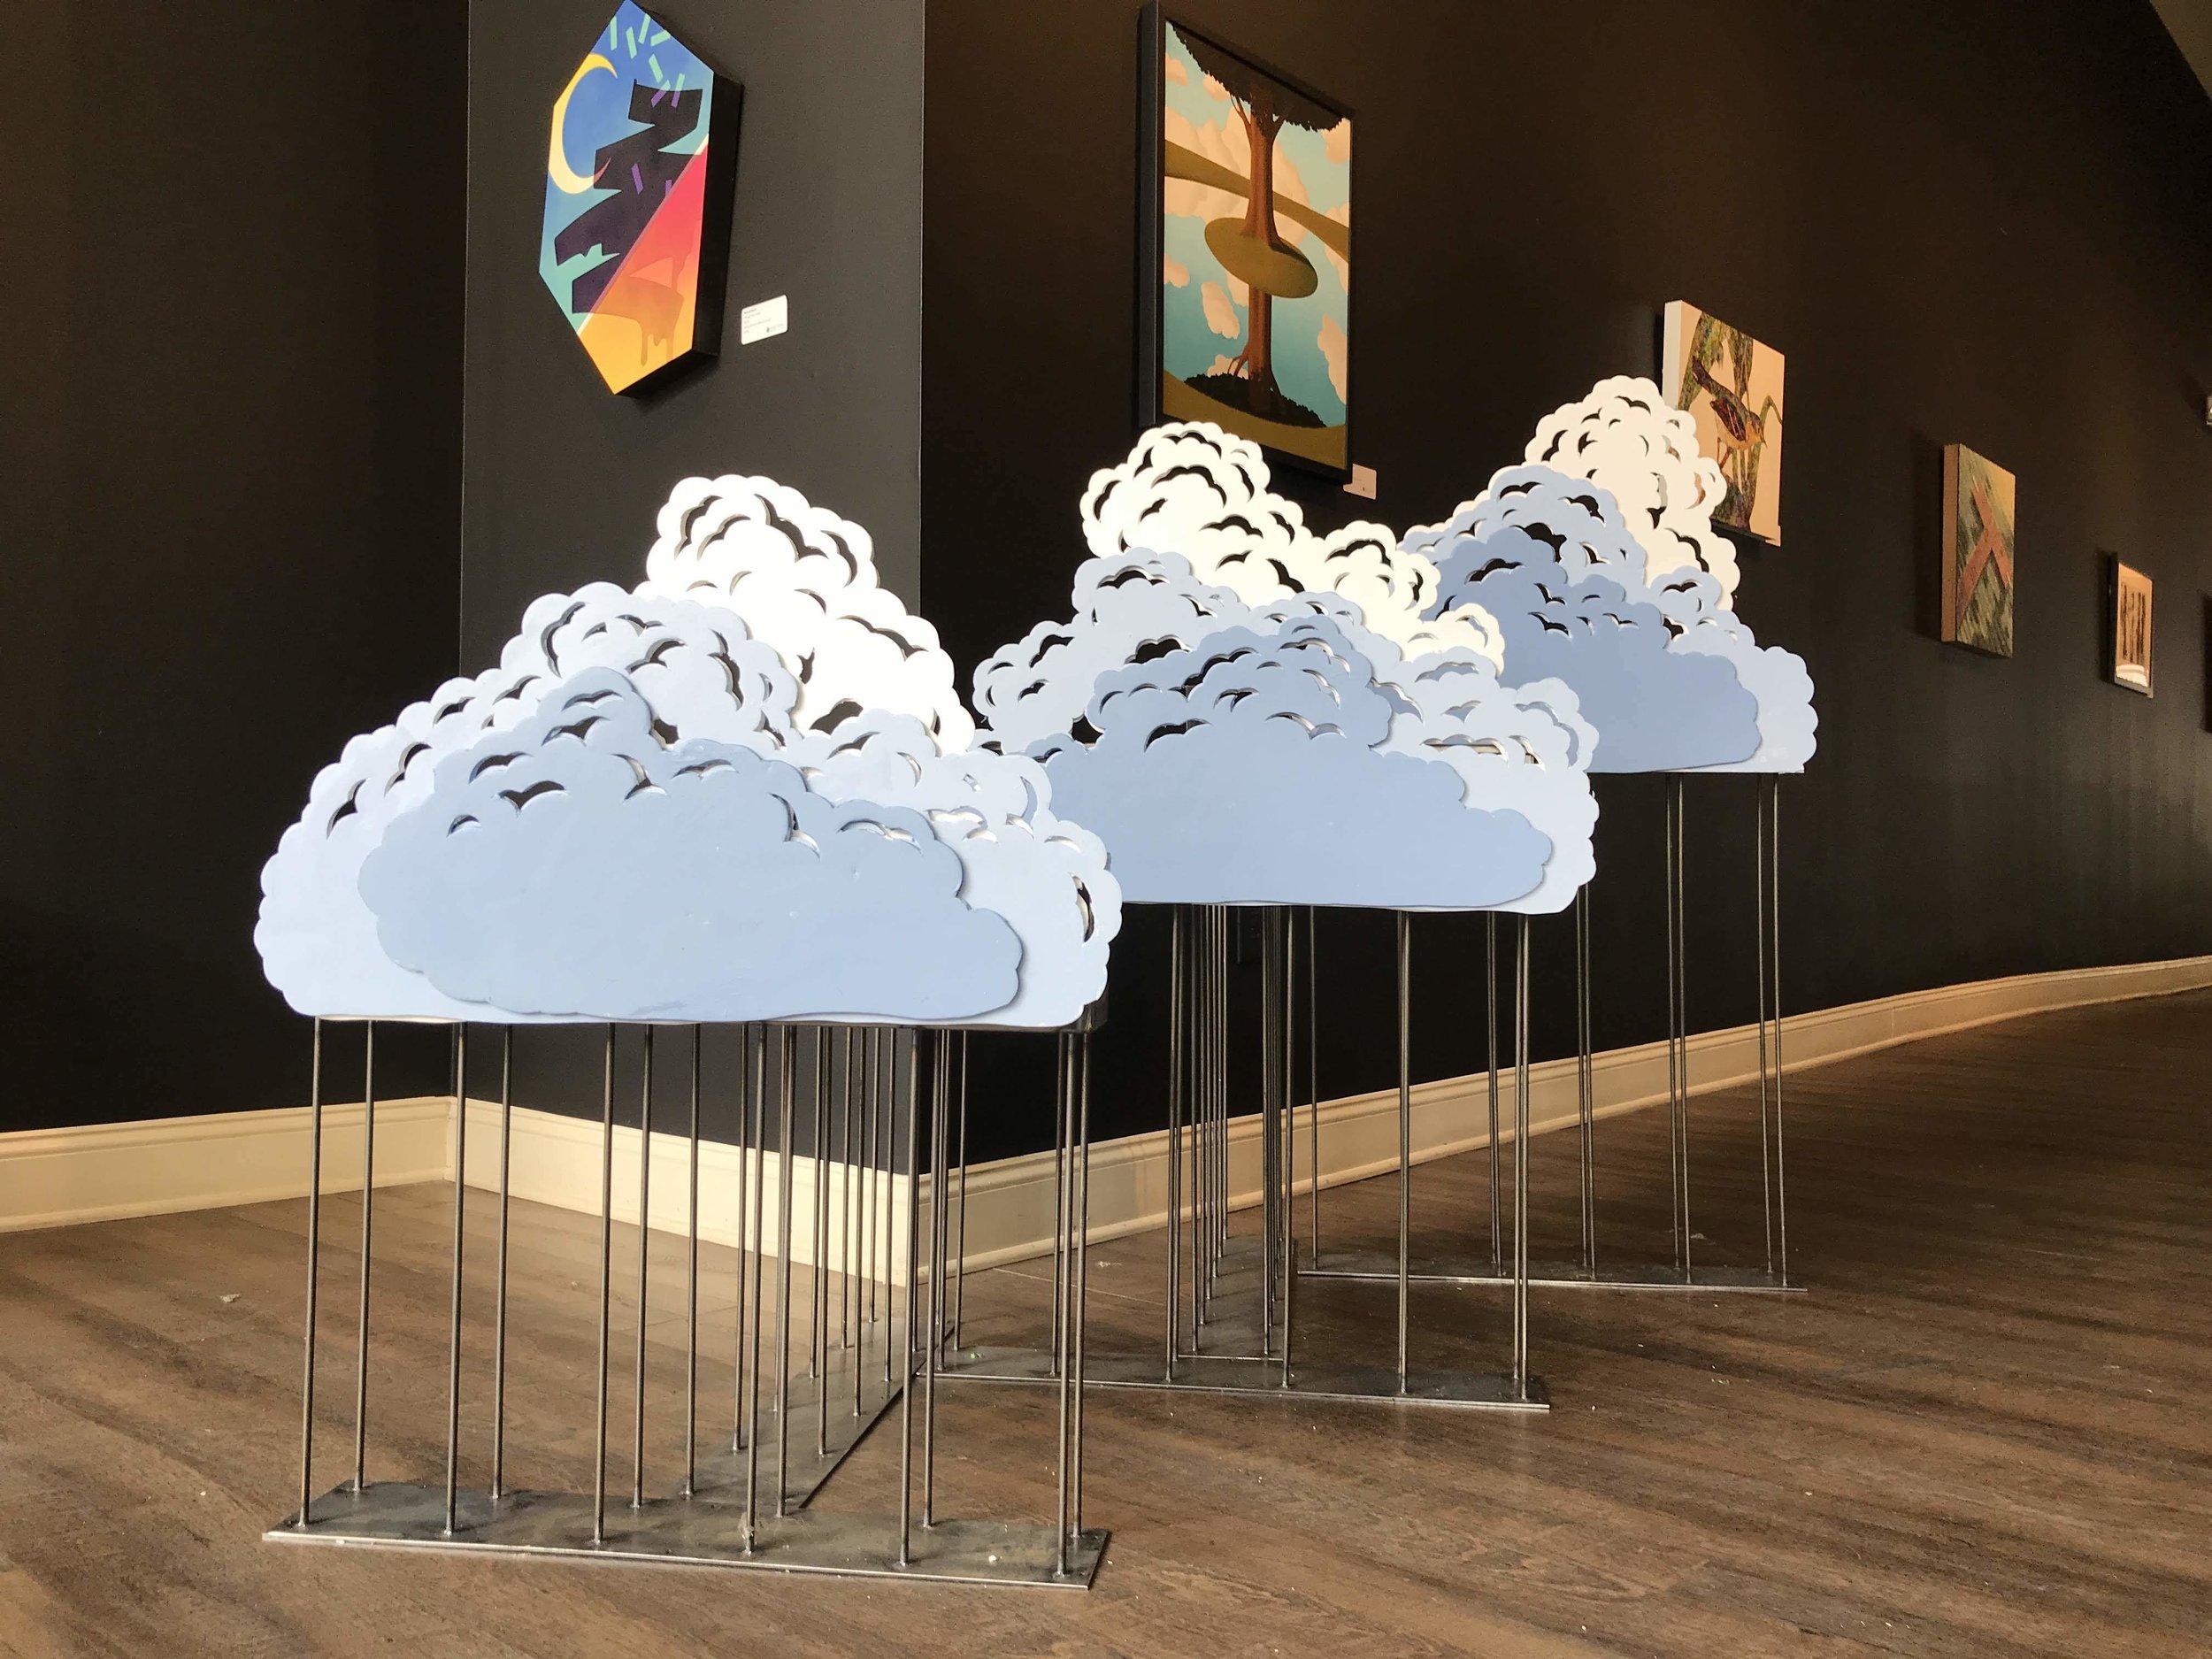 Miniature troughs, styrofoam clouds.